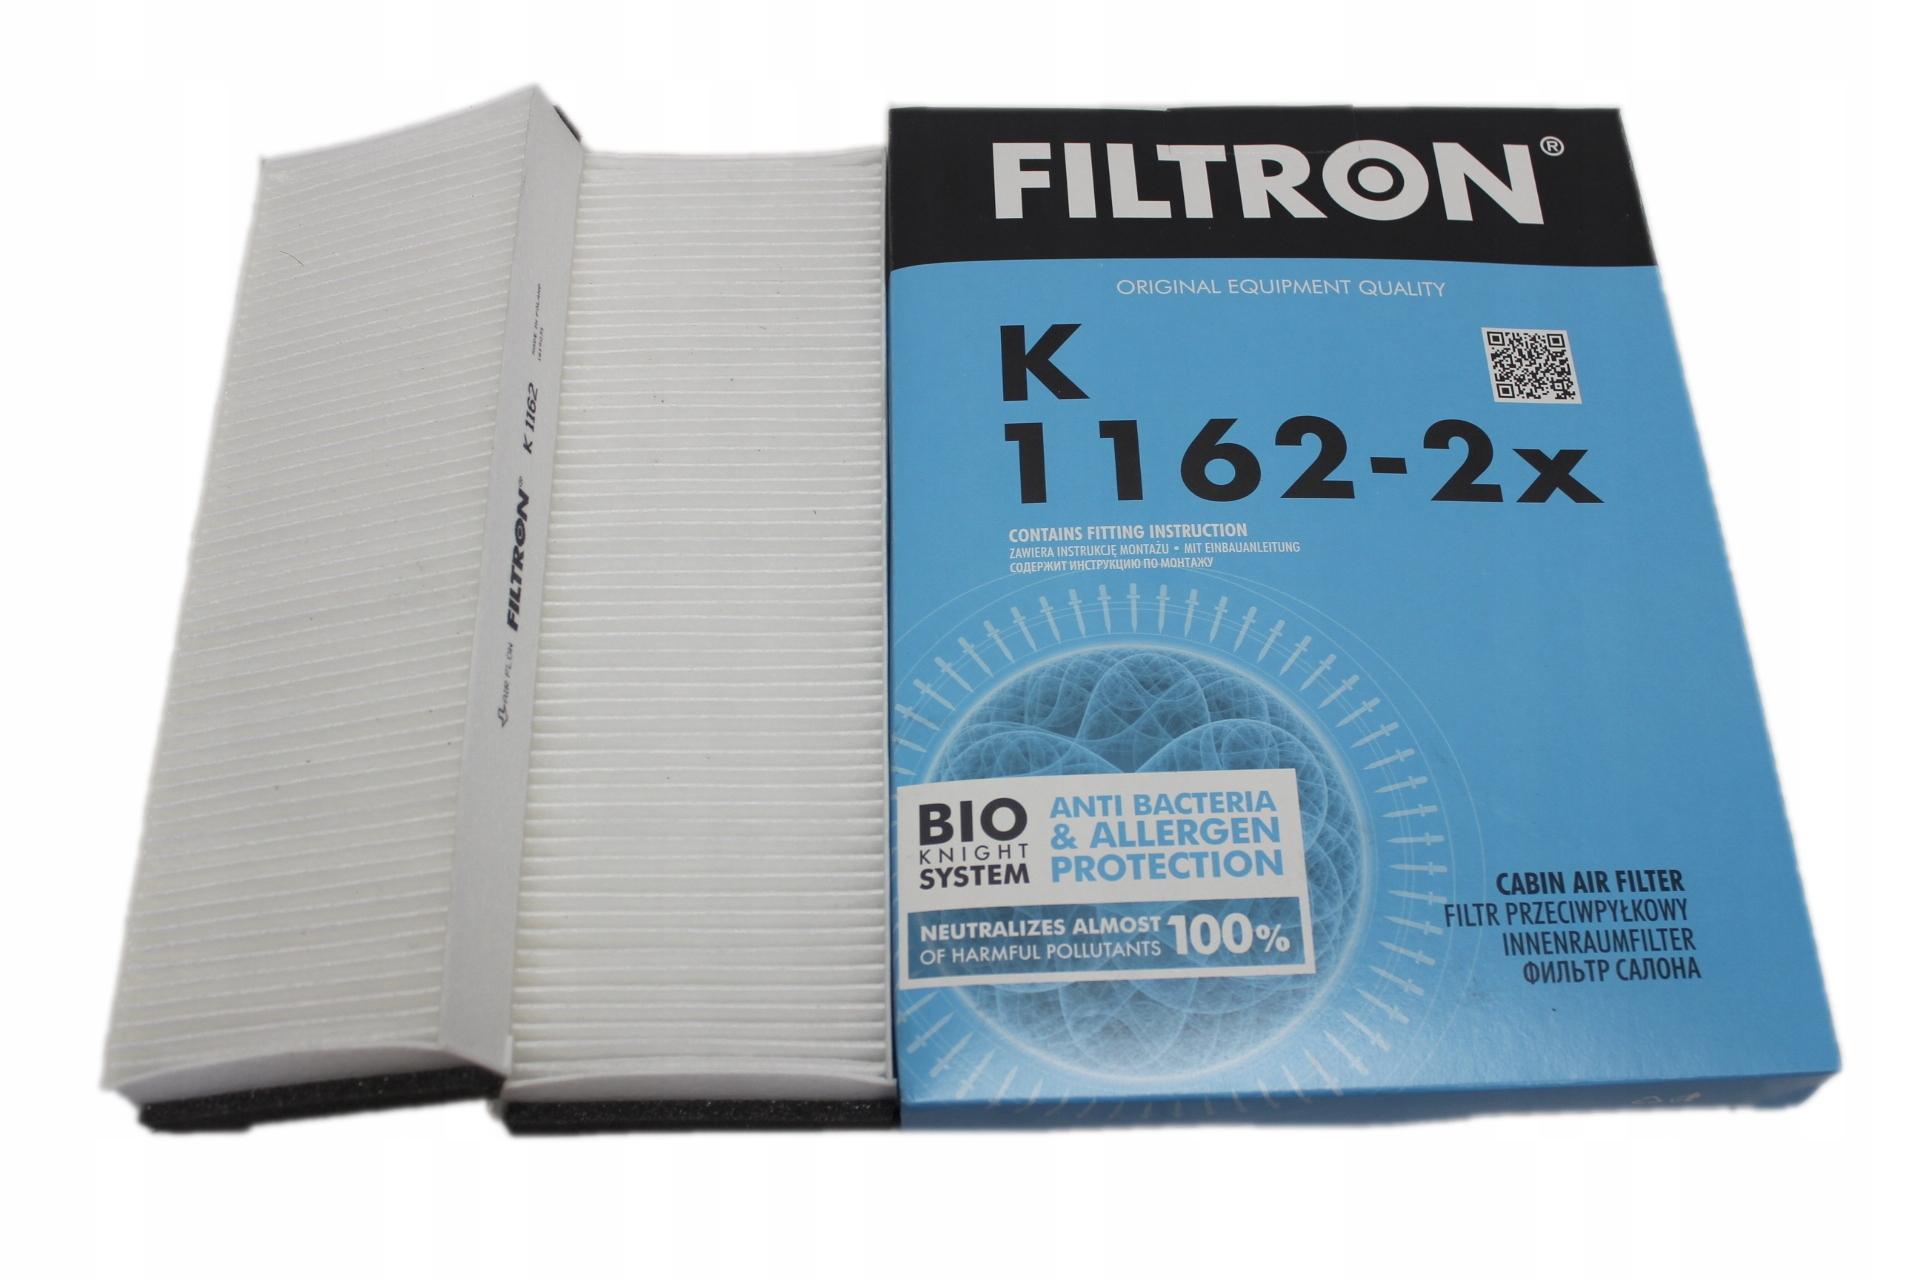 K 1162-2X (set)